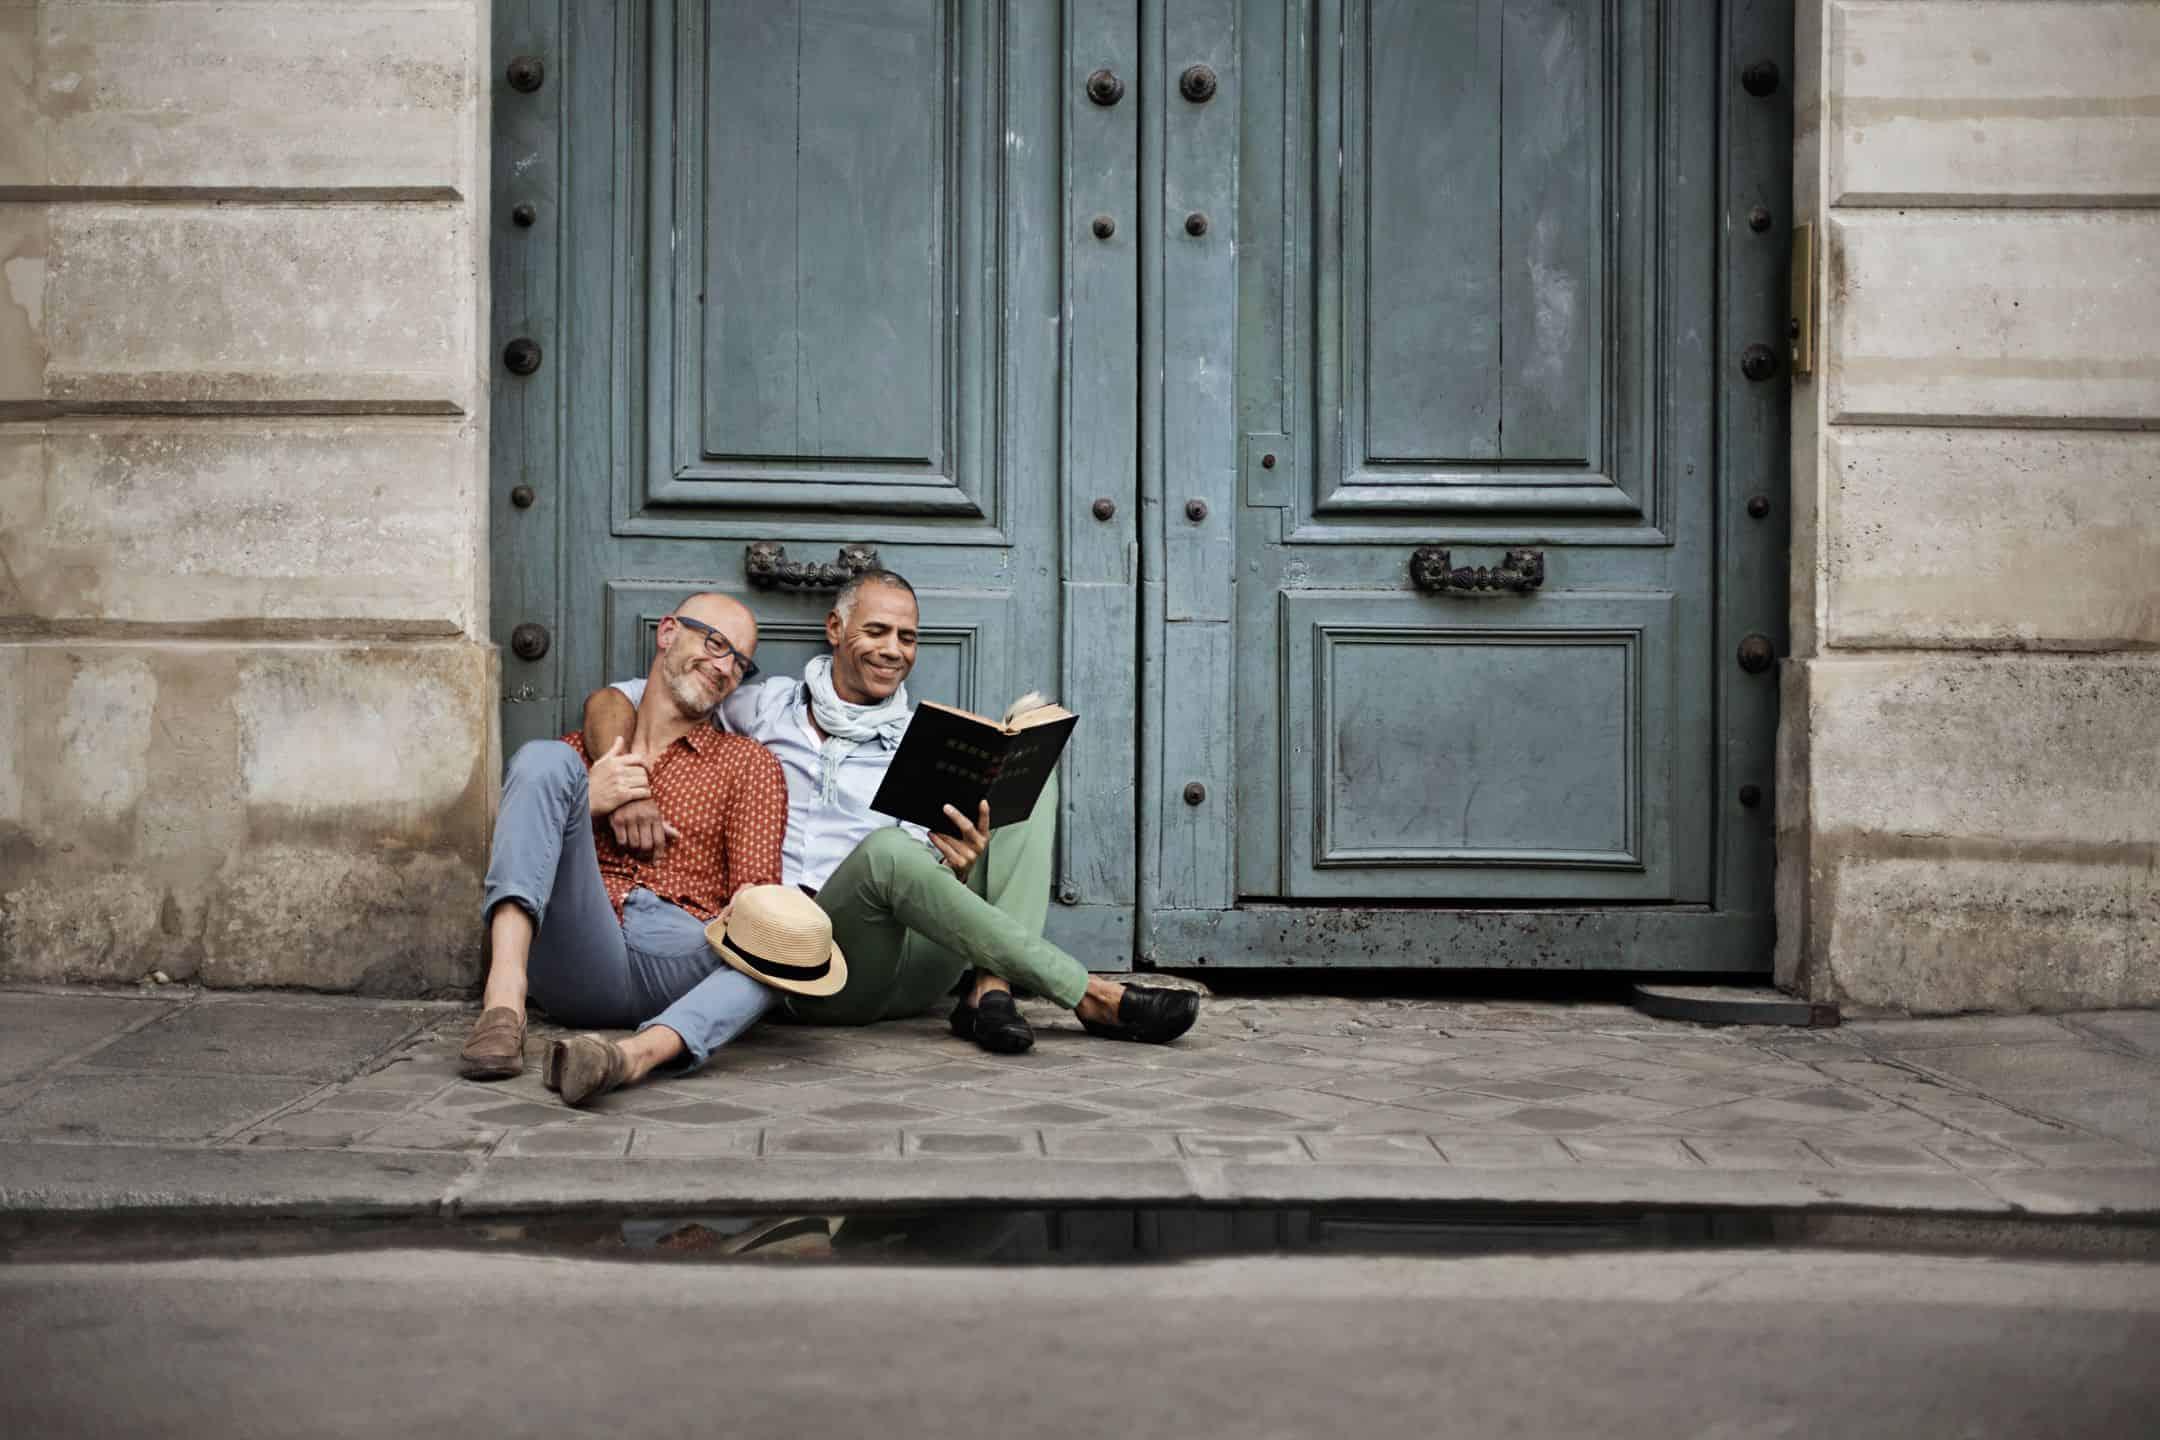 Paris GayStewards